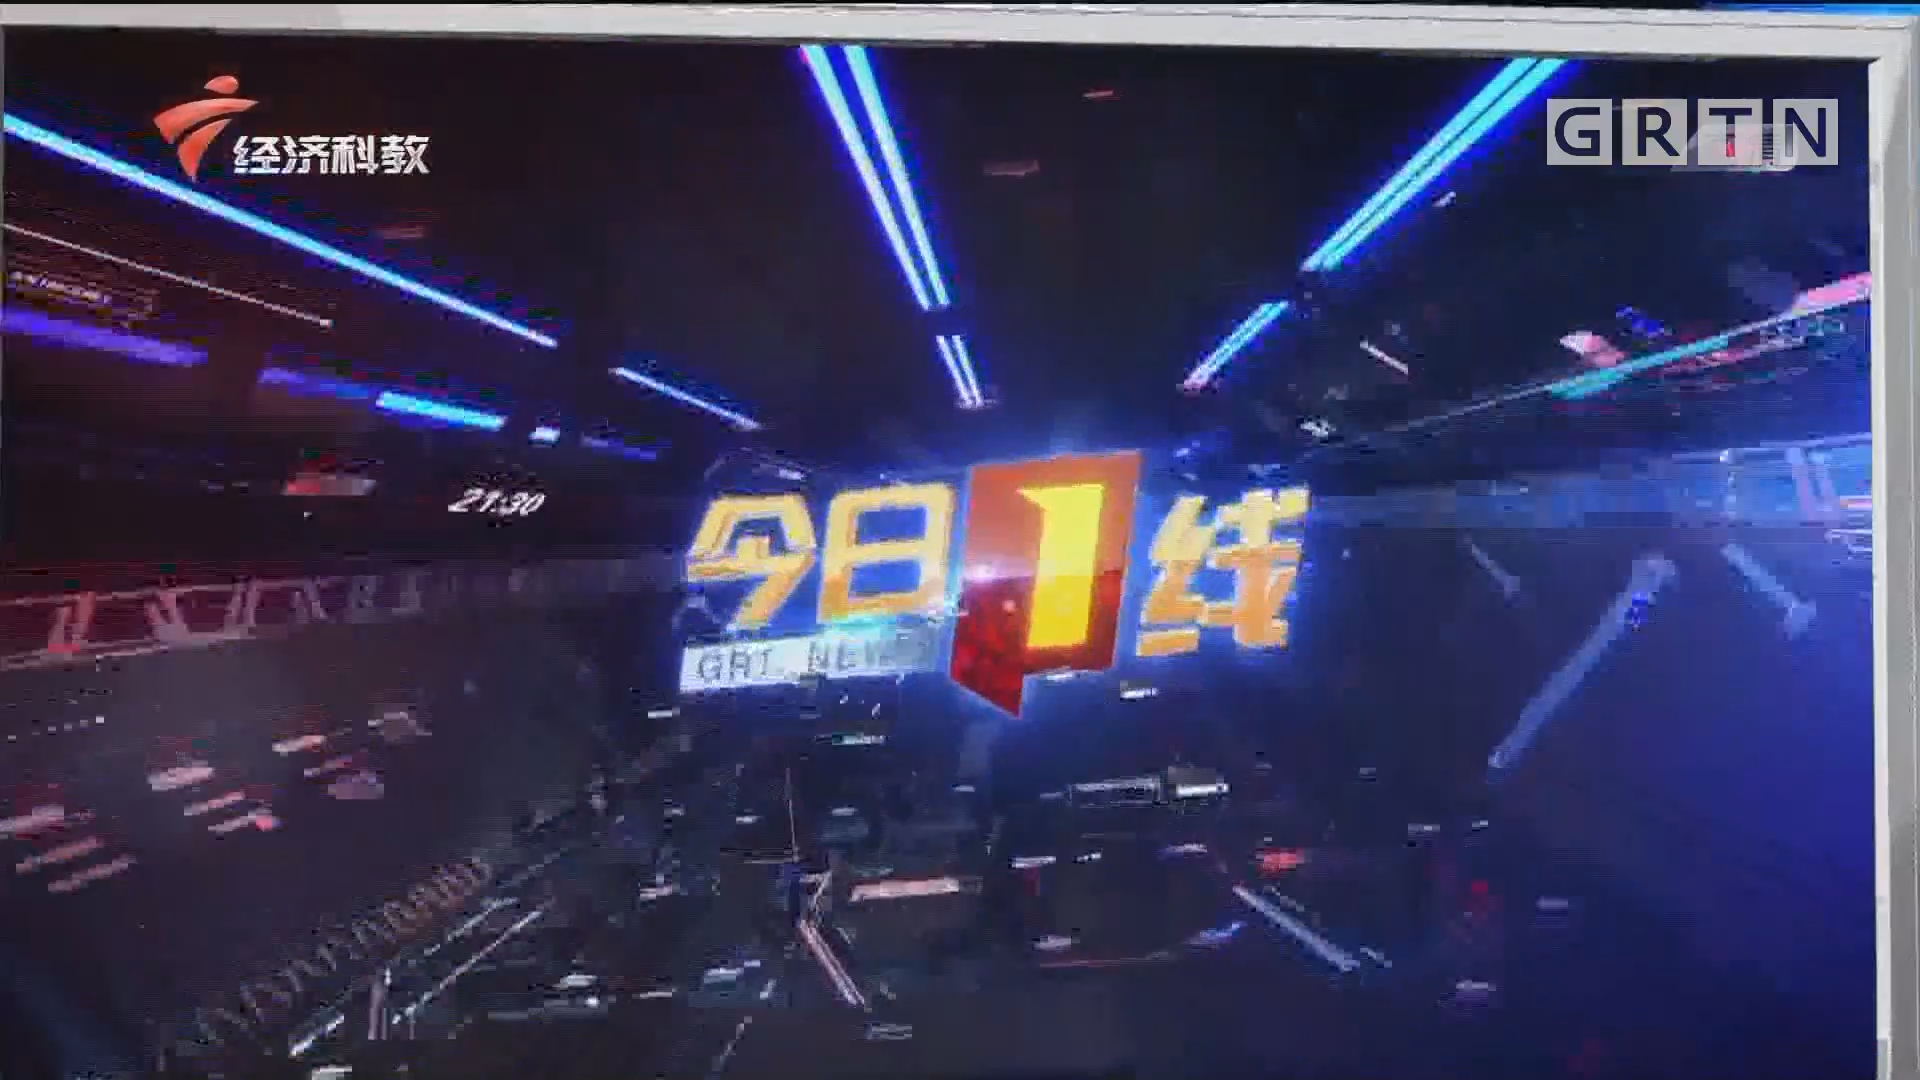 [HD][2020-02-12]今日一线:广州海珠:保利天悦小区确诊6例 全栋楼住户分批转移隔离观察